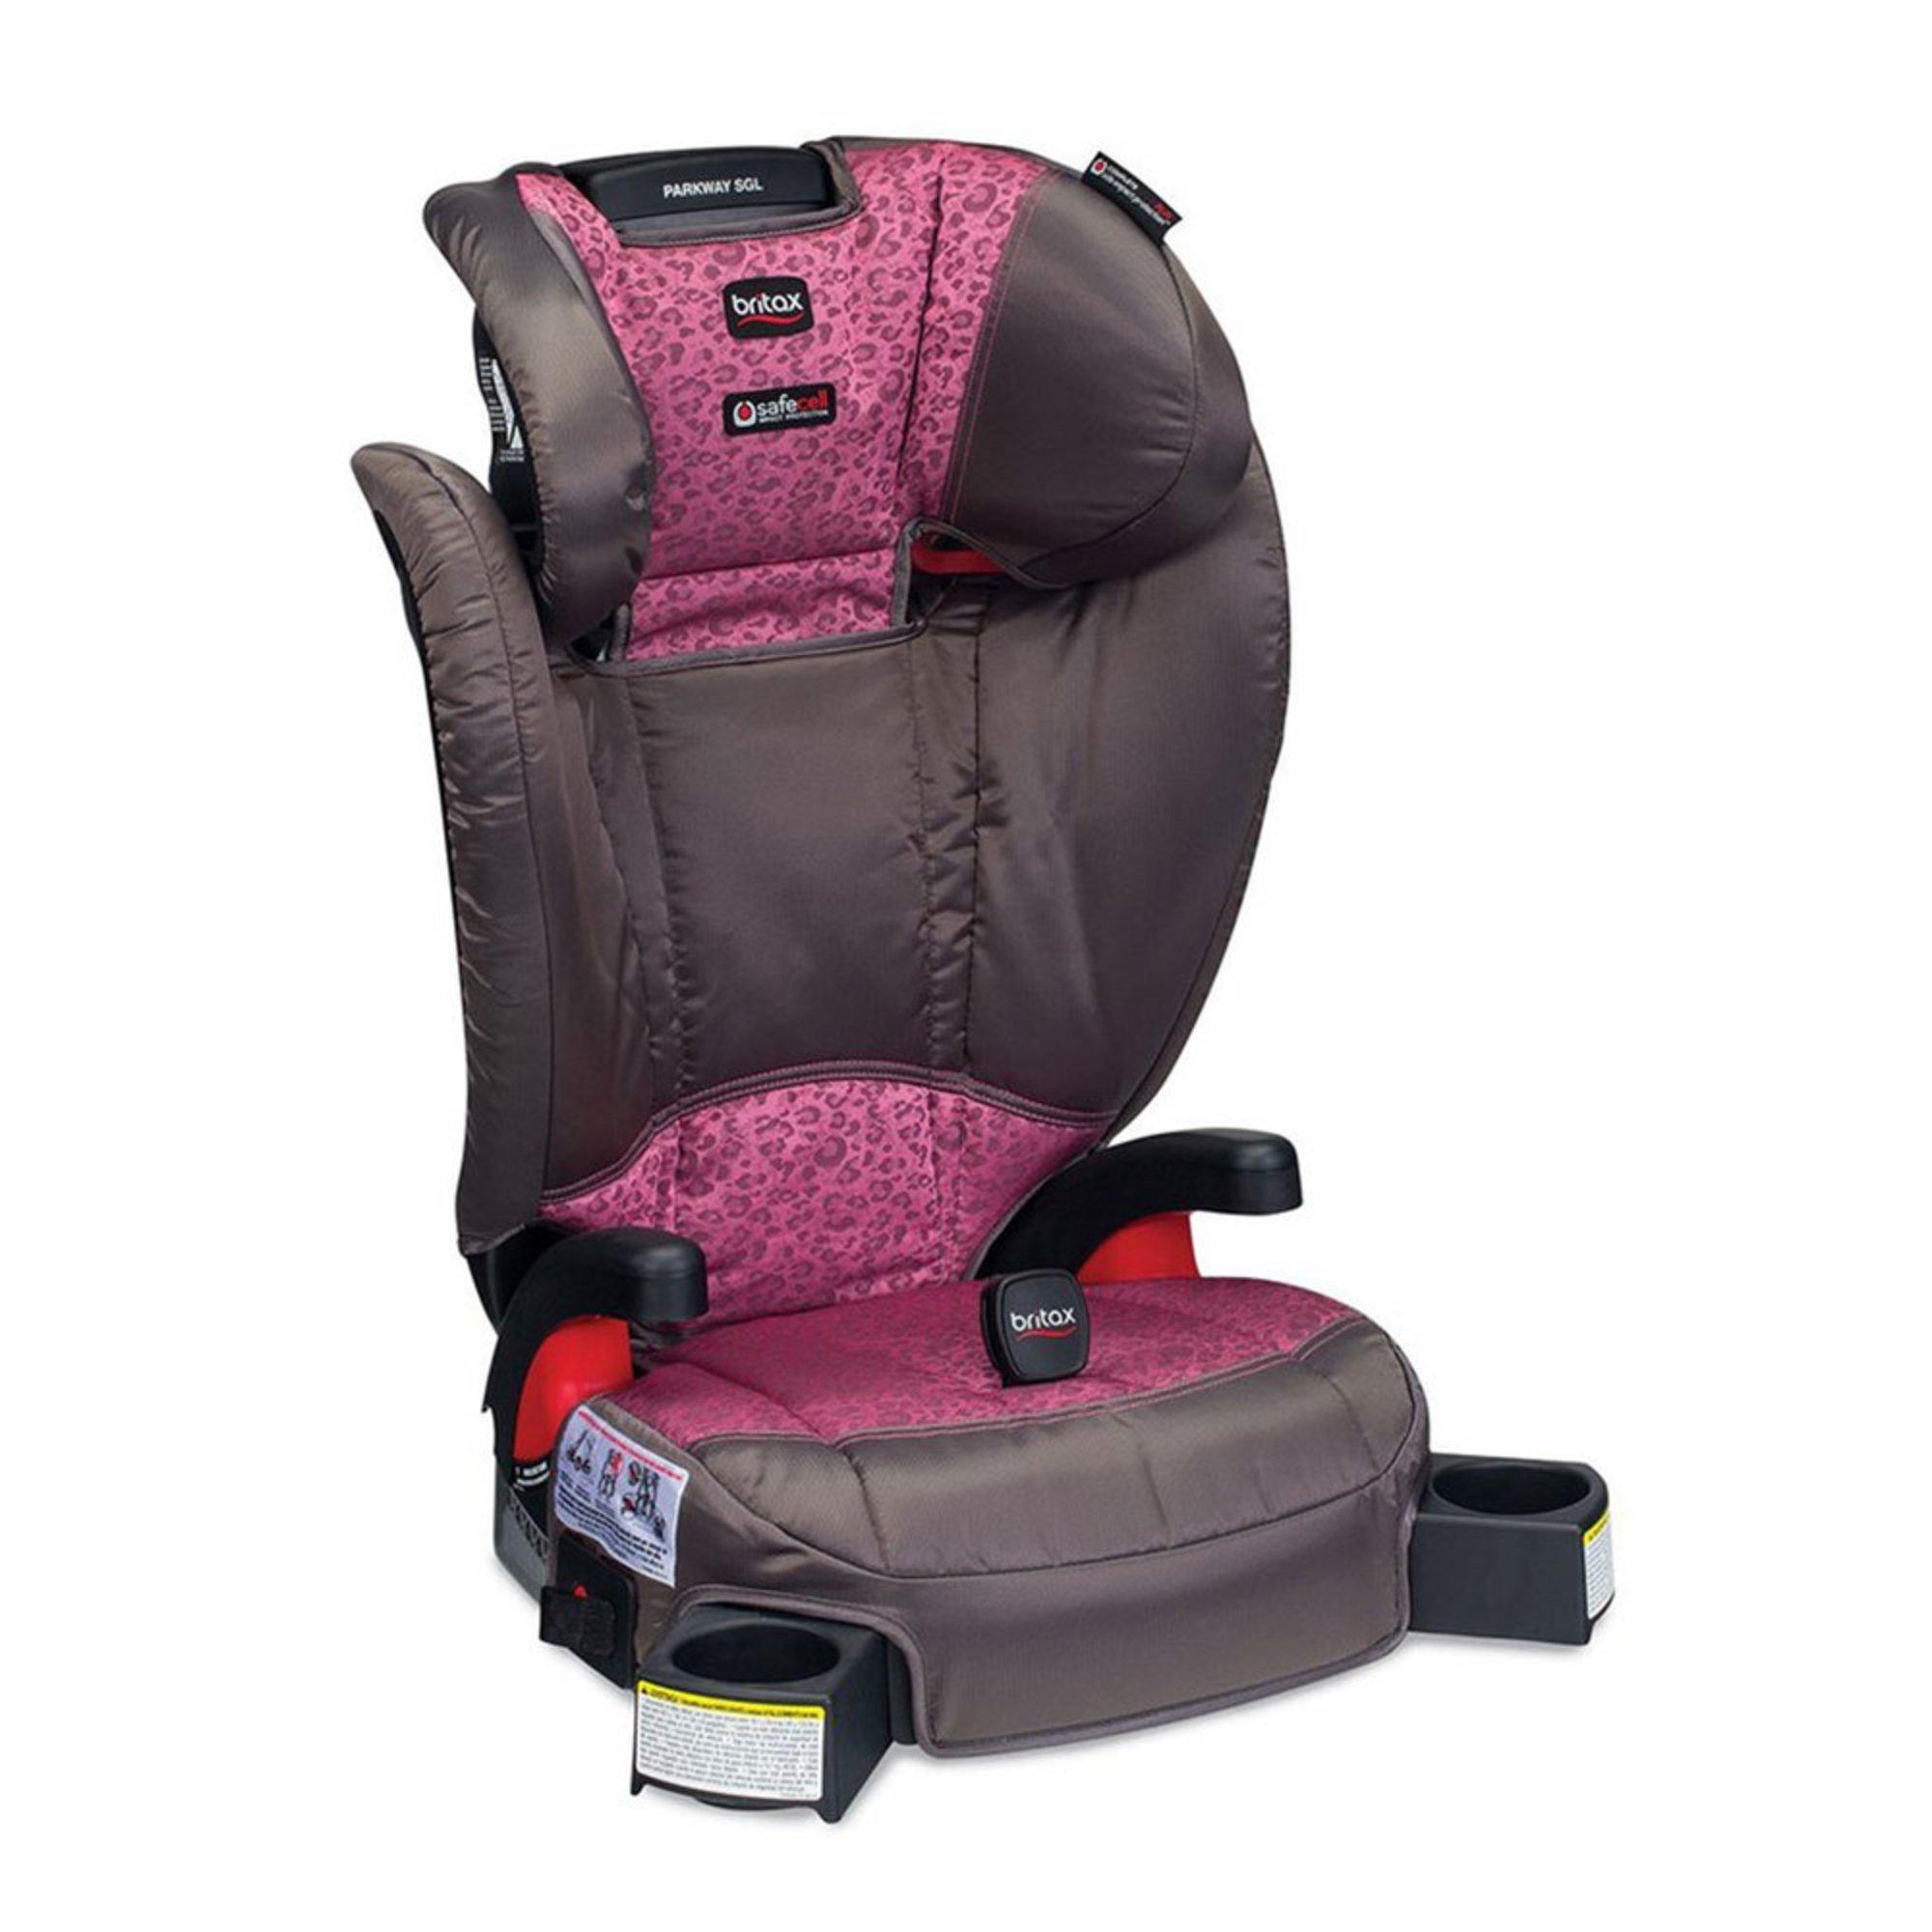 f4c6ef0348f Britax Parkway Sgl Belt-positioning Booster Seat